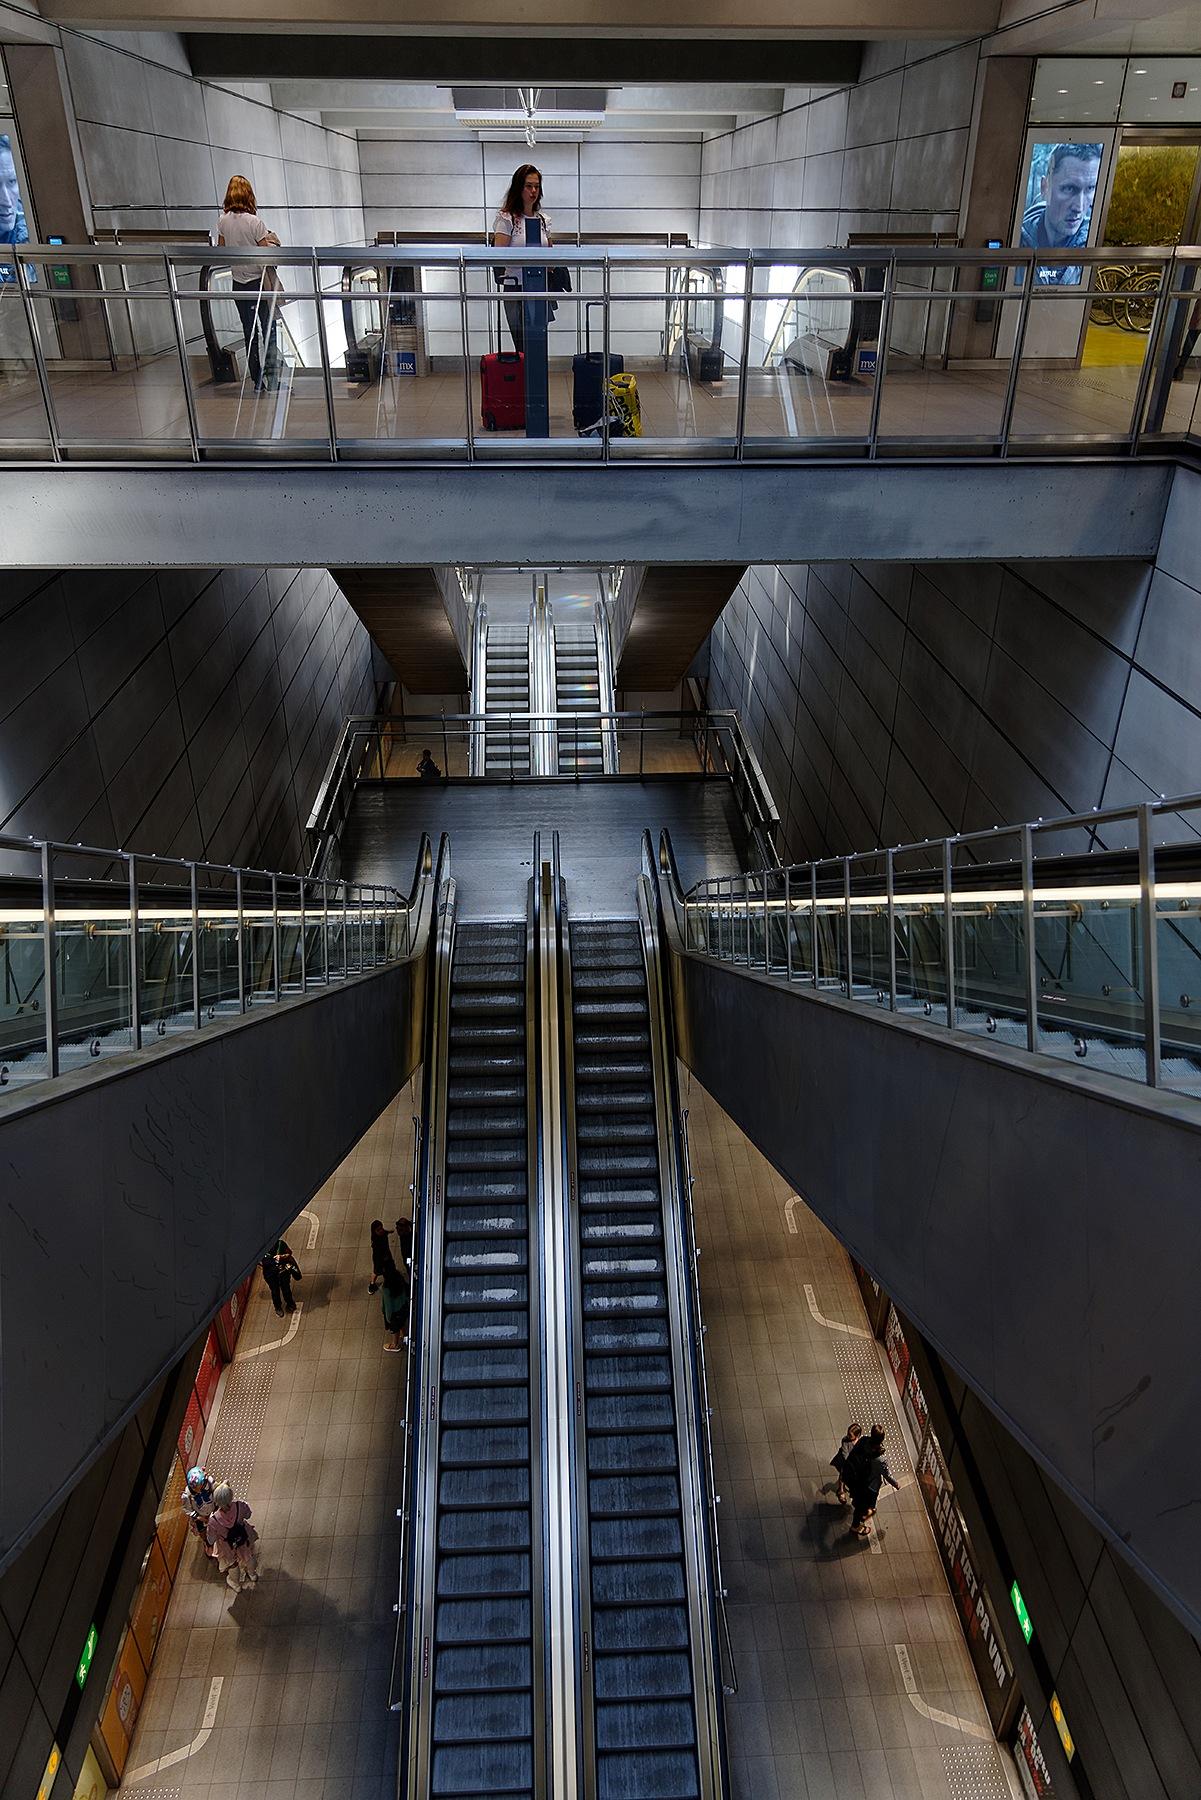 Metro by per f andersen